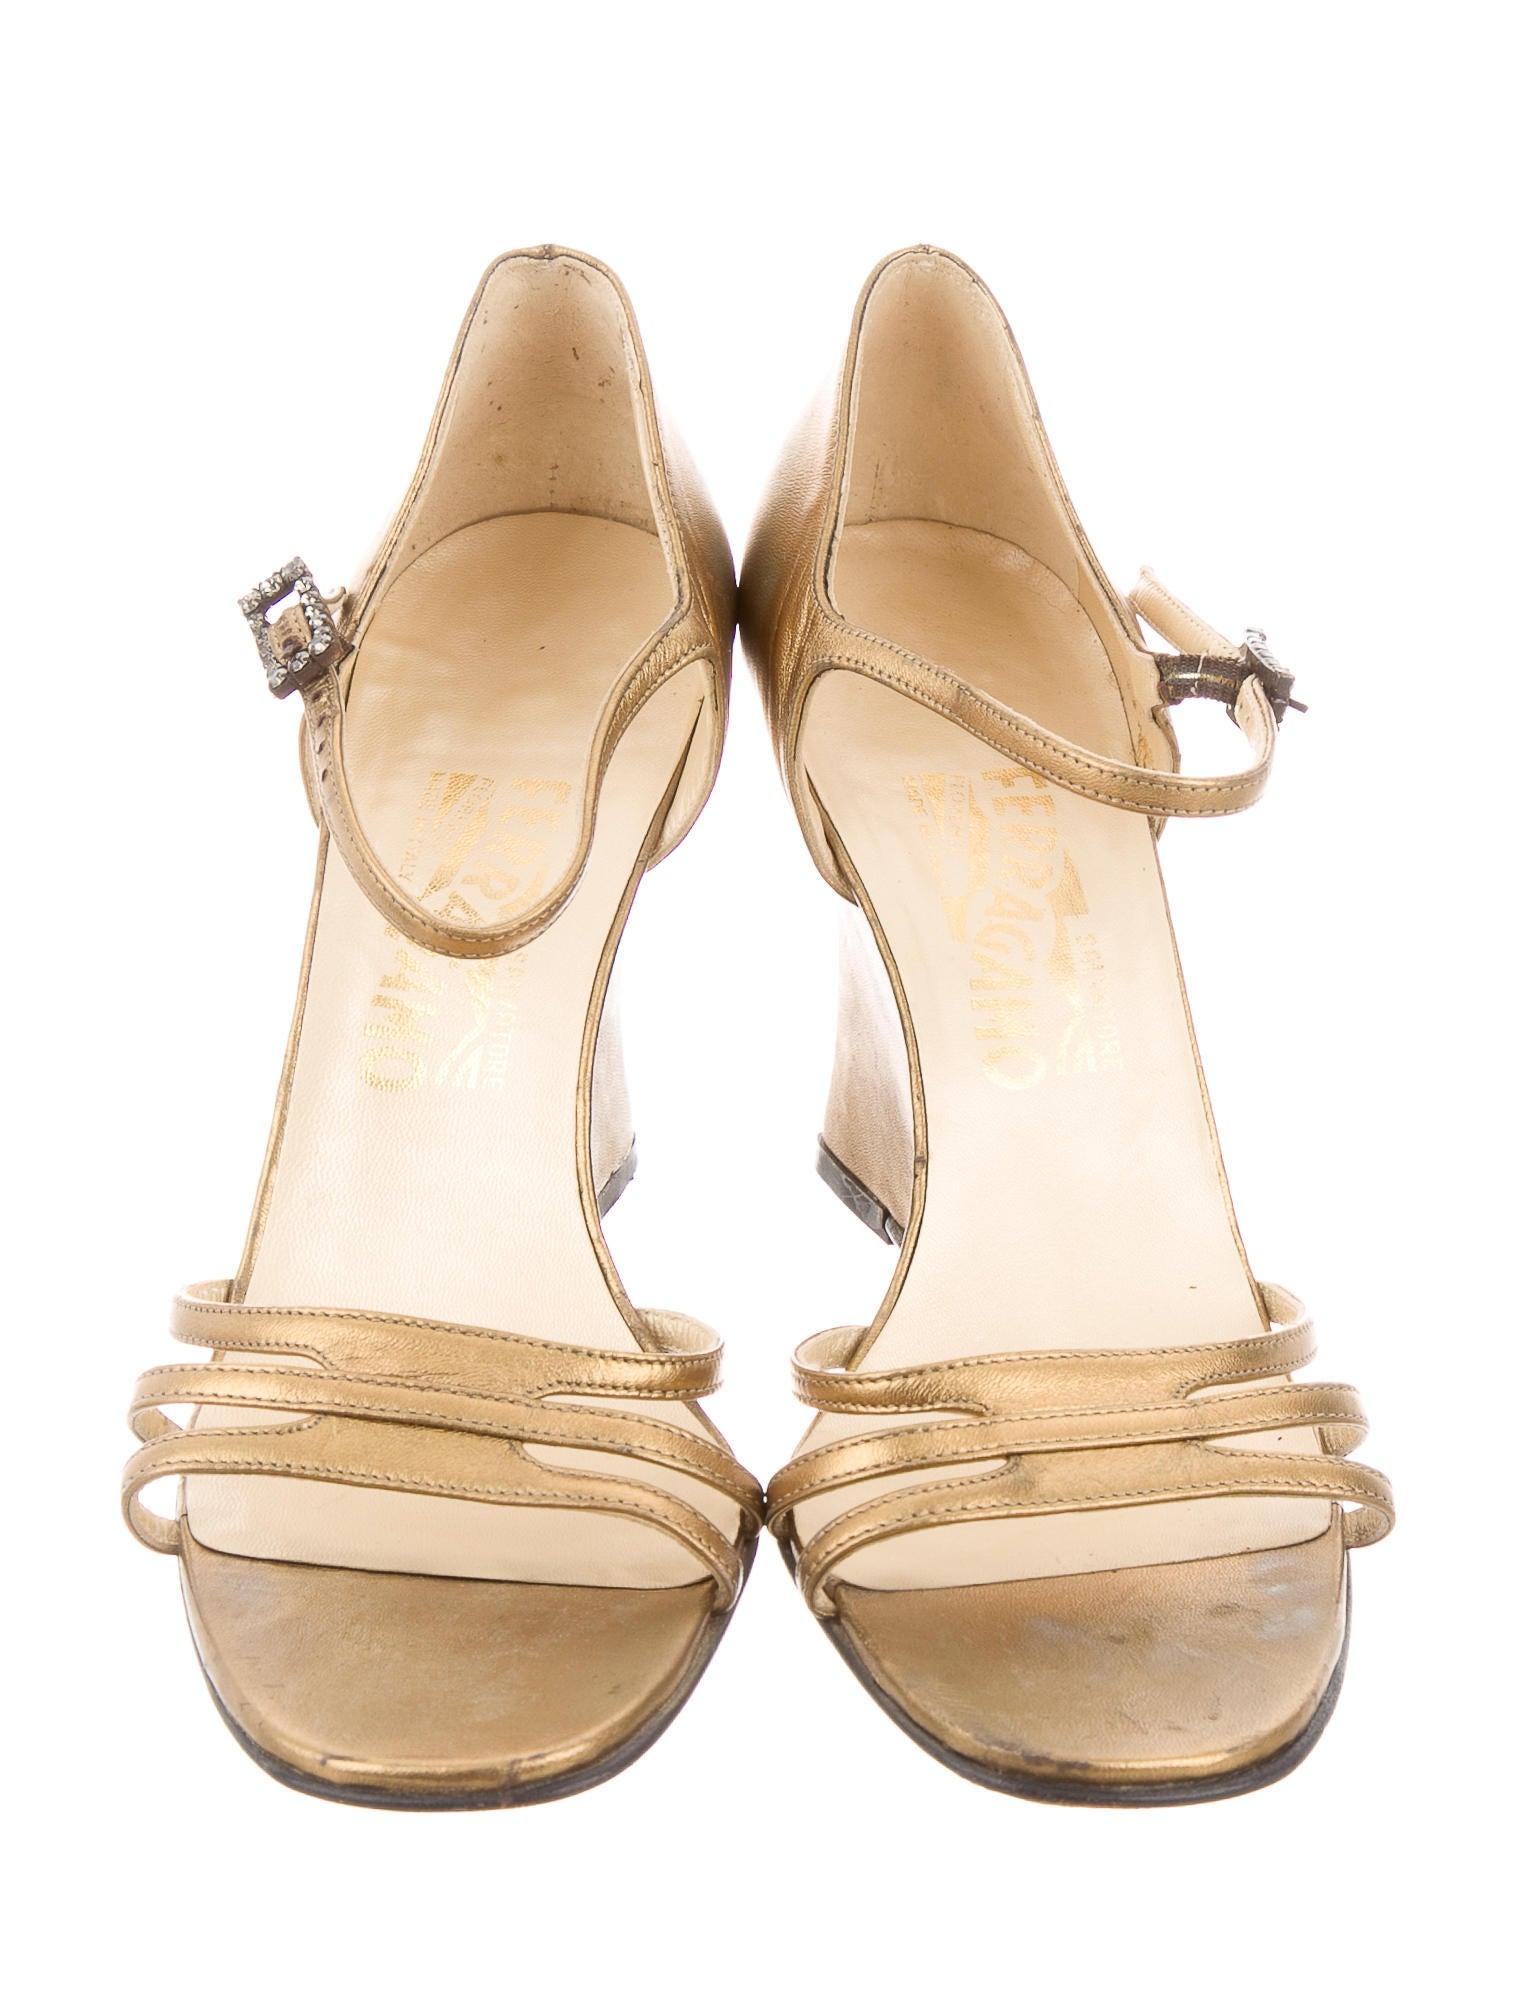 salvatore ferragamo metallic wedge sandals shoes